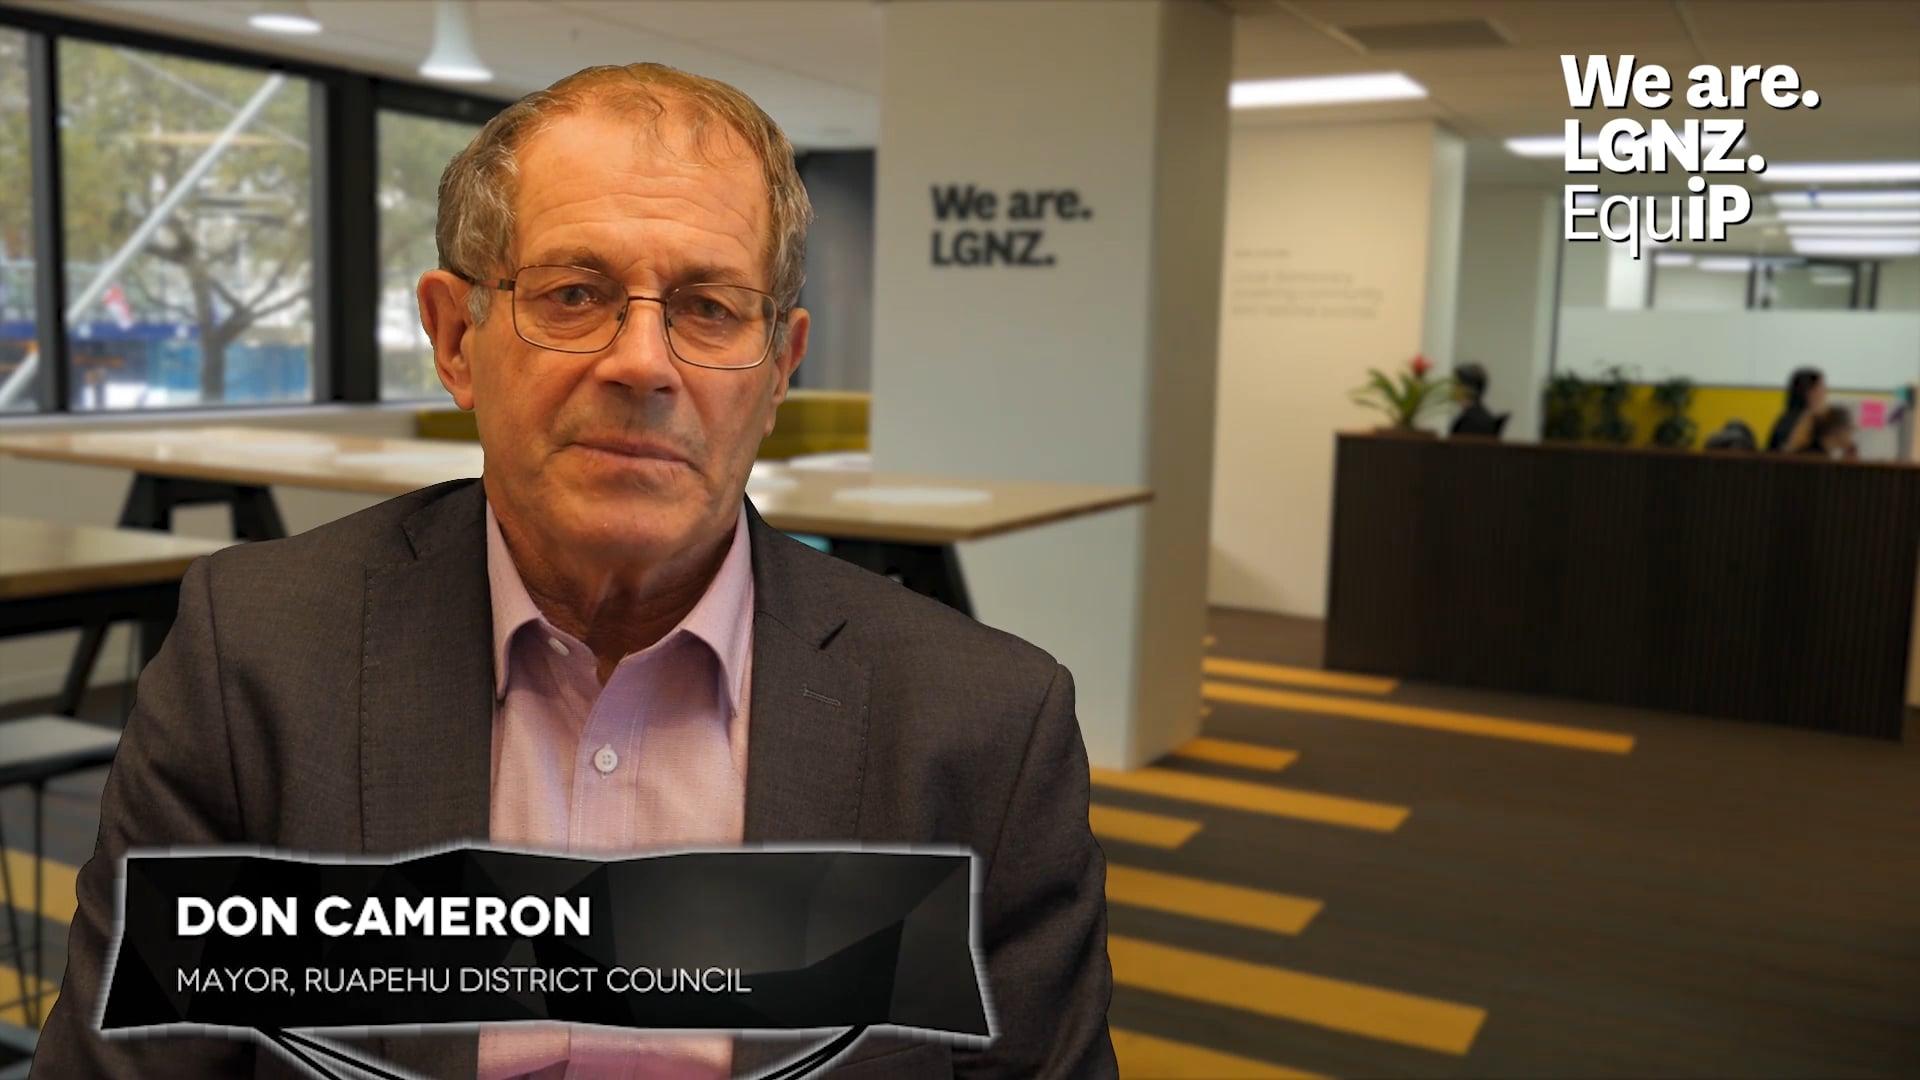 Benefits of Professional Development - Don Cameron